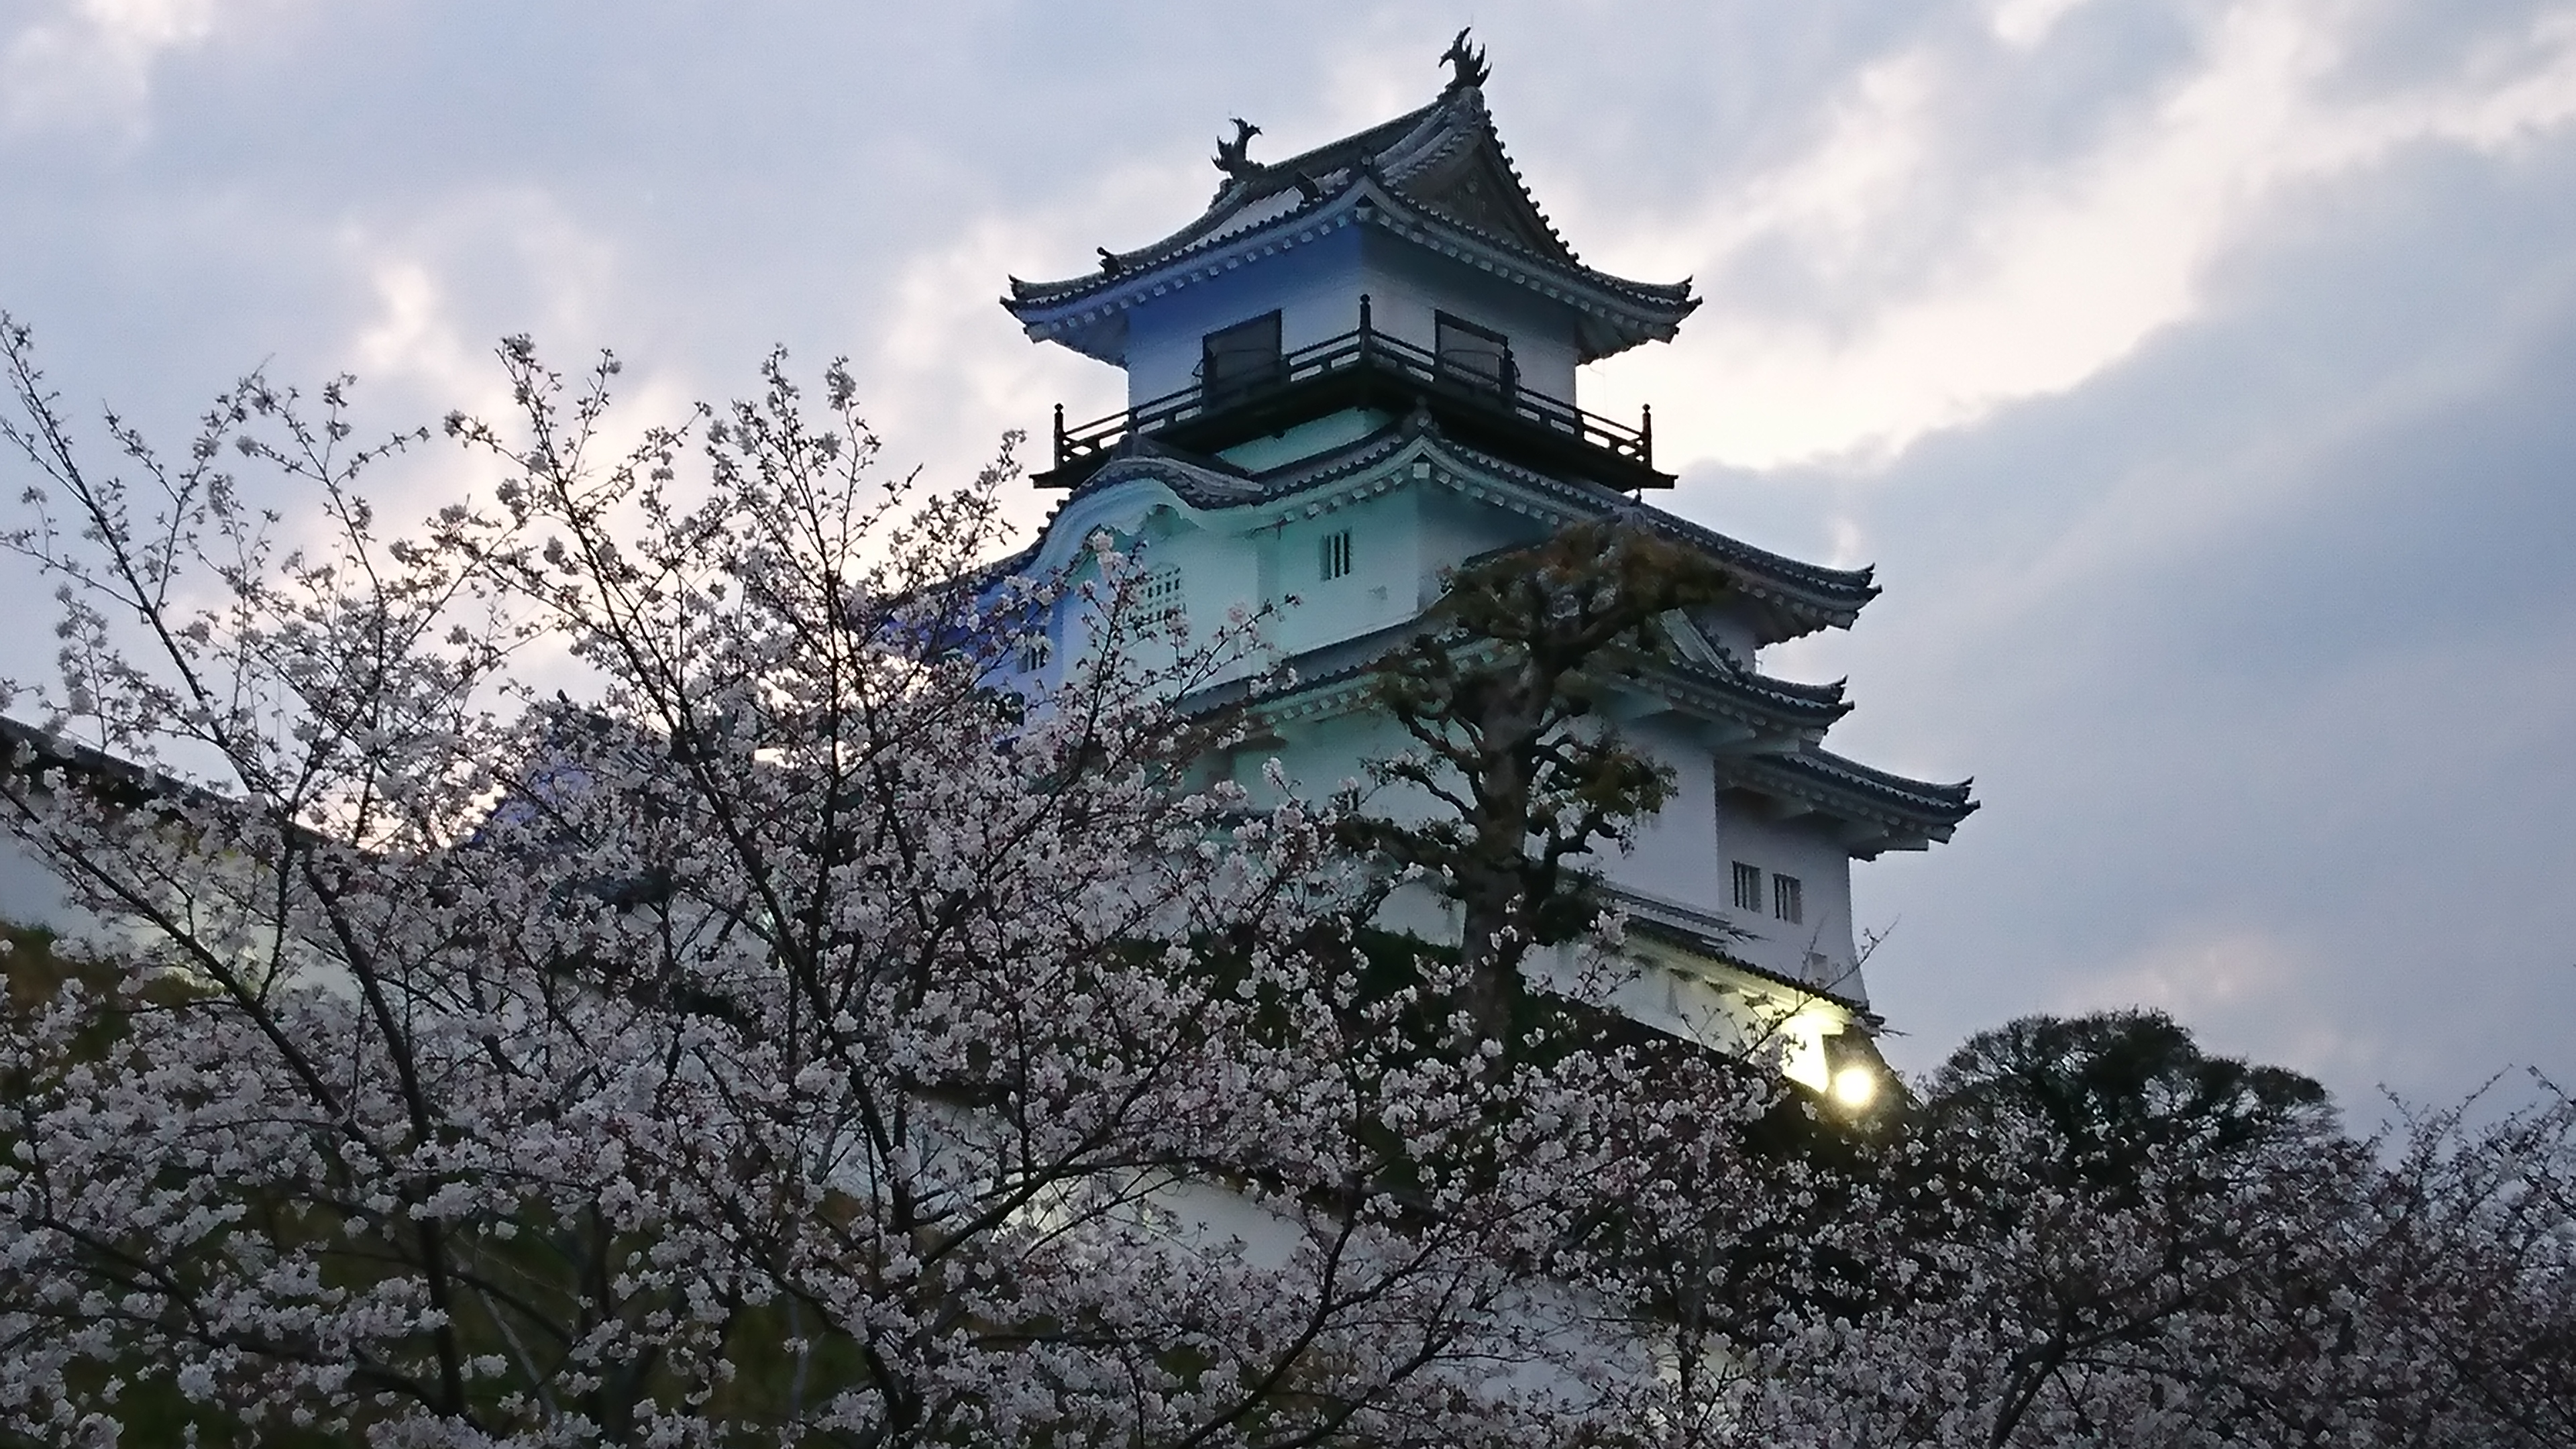 http://www.inoue-satoshi.com/diary/DSC_0056.JPG